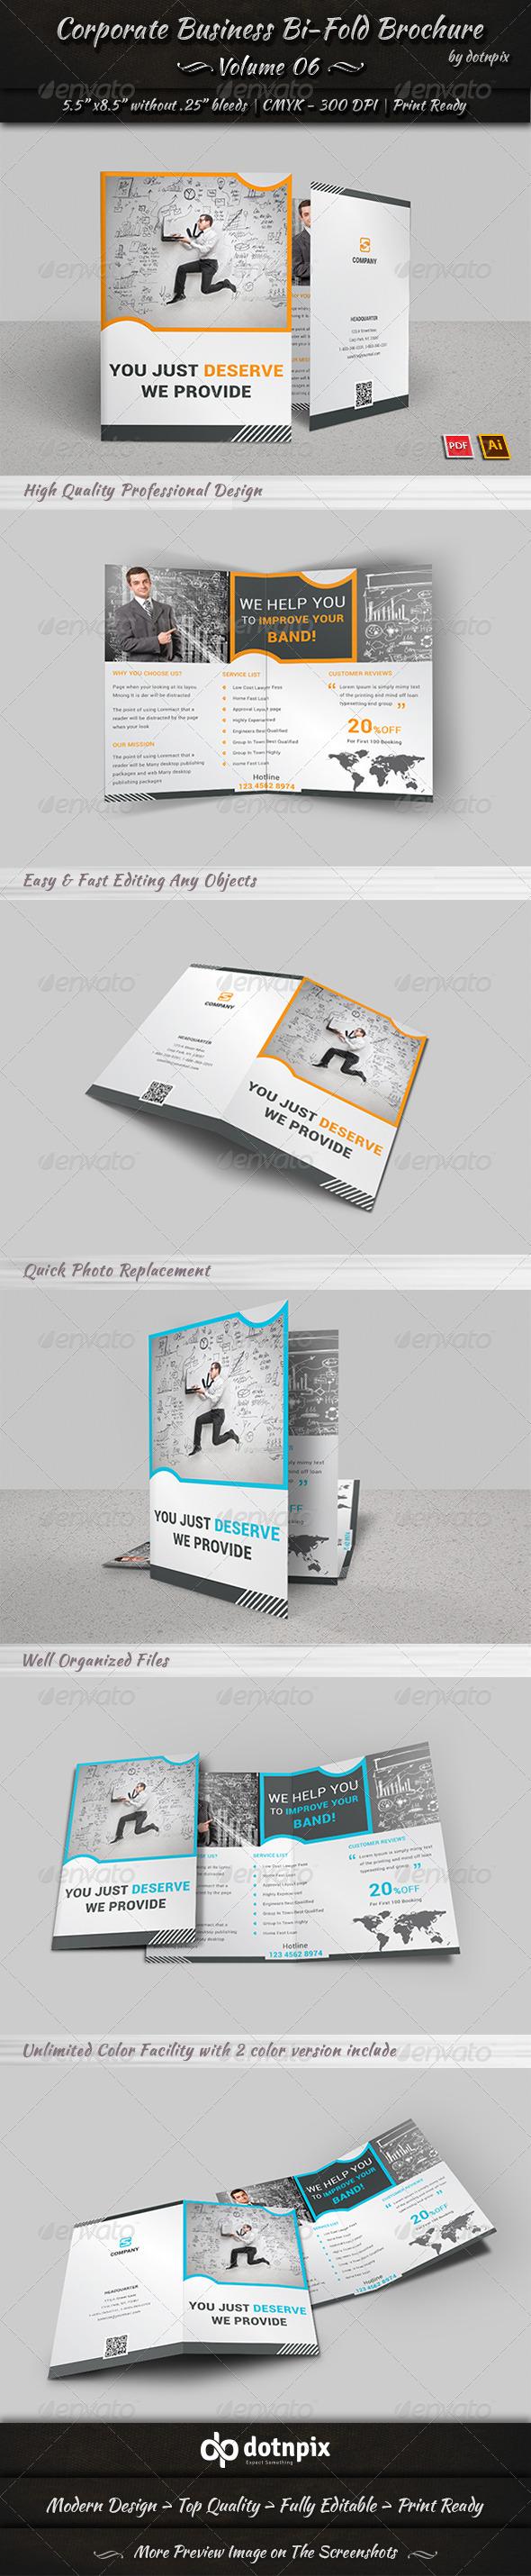 GraphicRiver Corporate Business Bi-Fold Brochure Volume 6 8010080